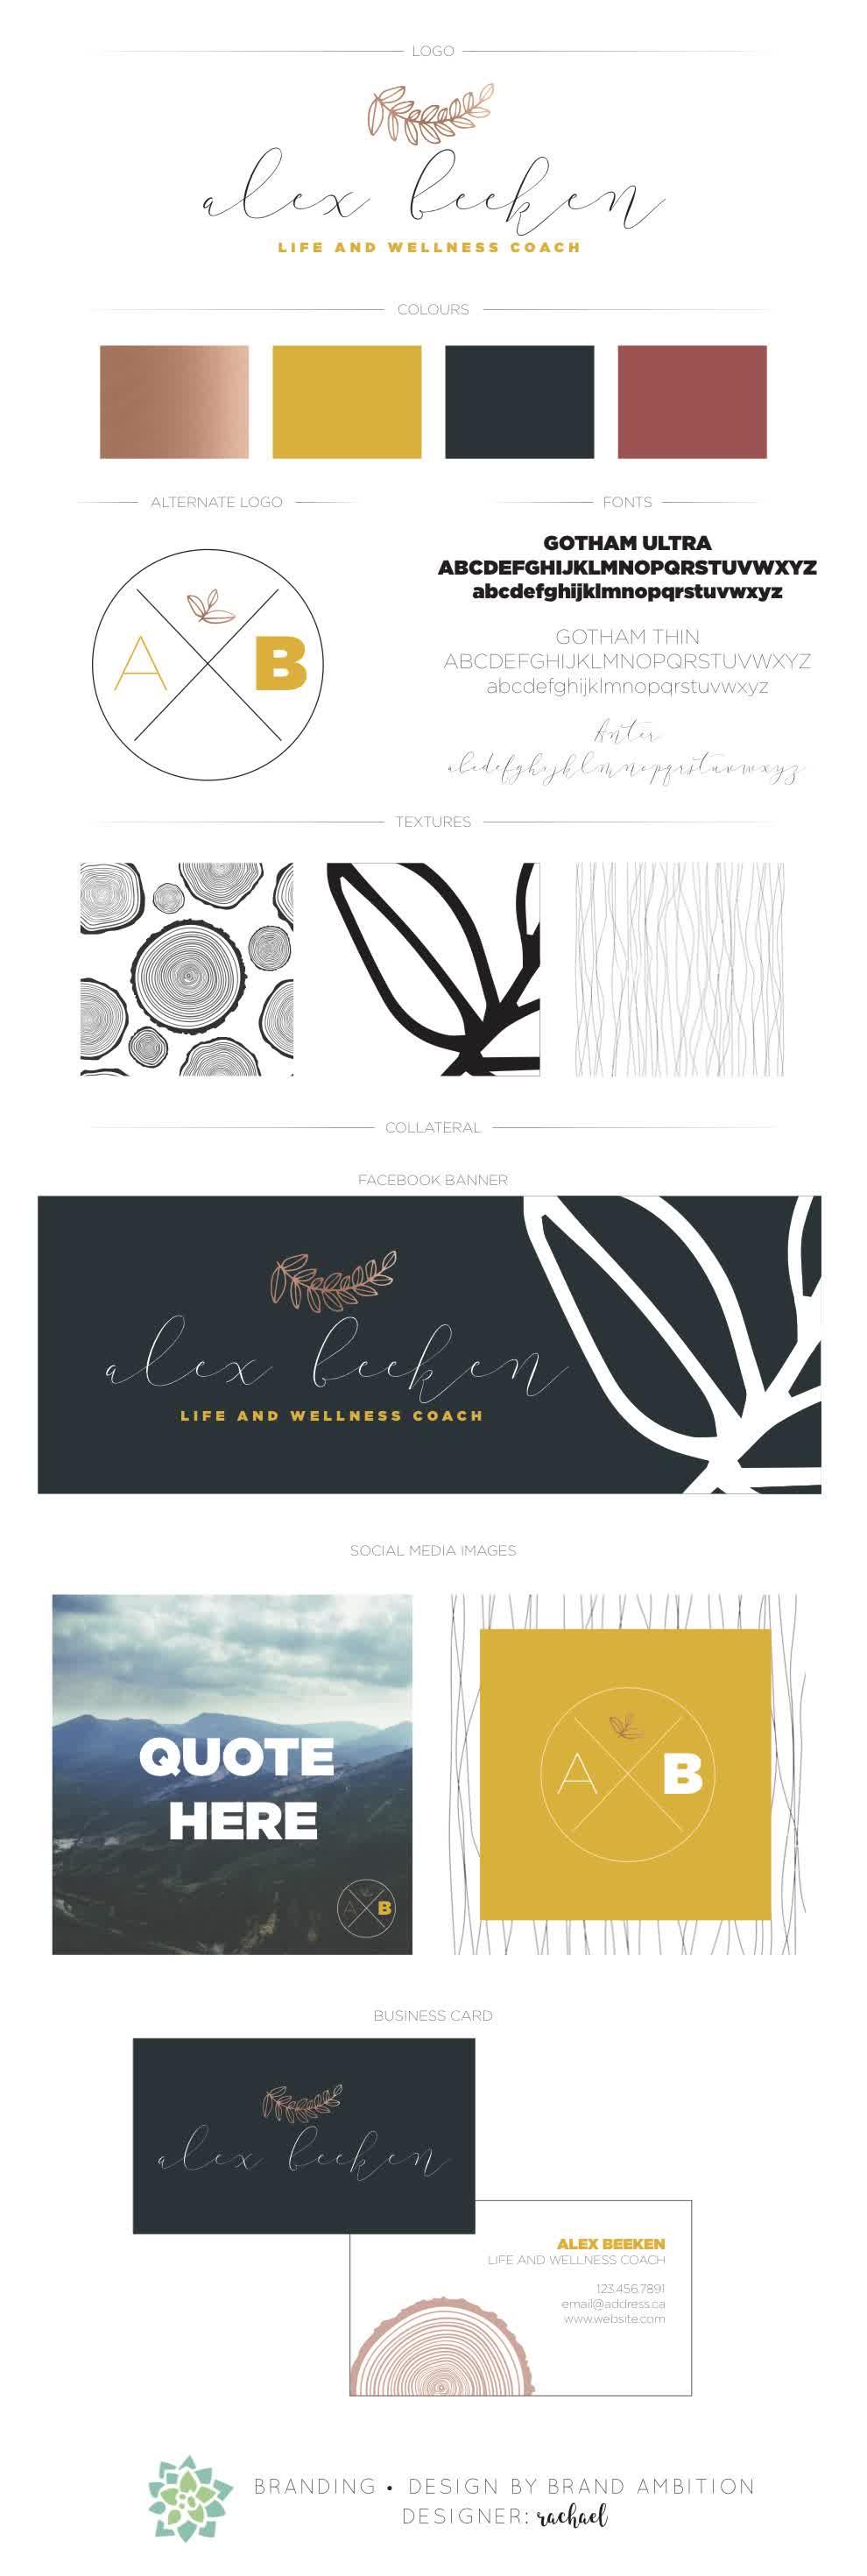 alex beekan brand board brand ambition marketing branding agency